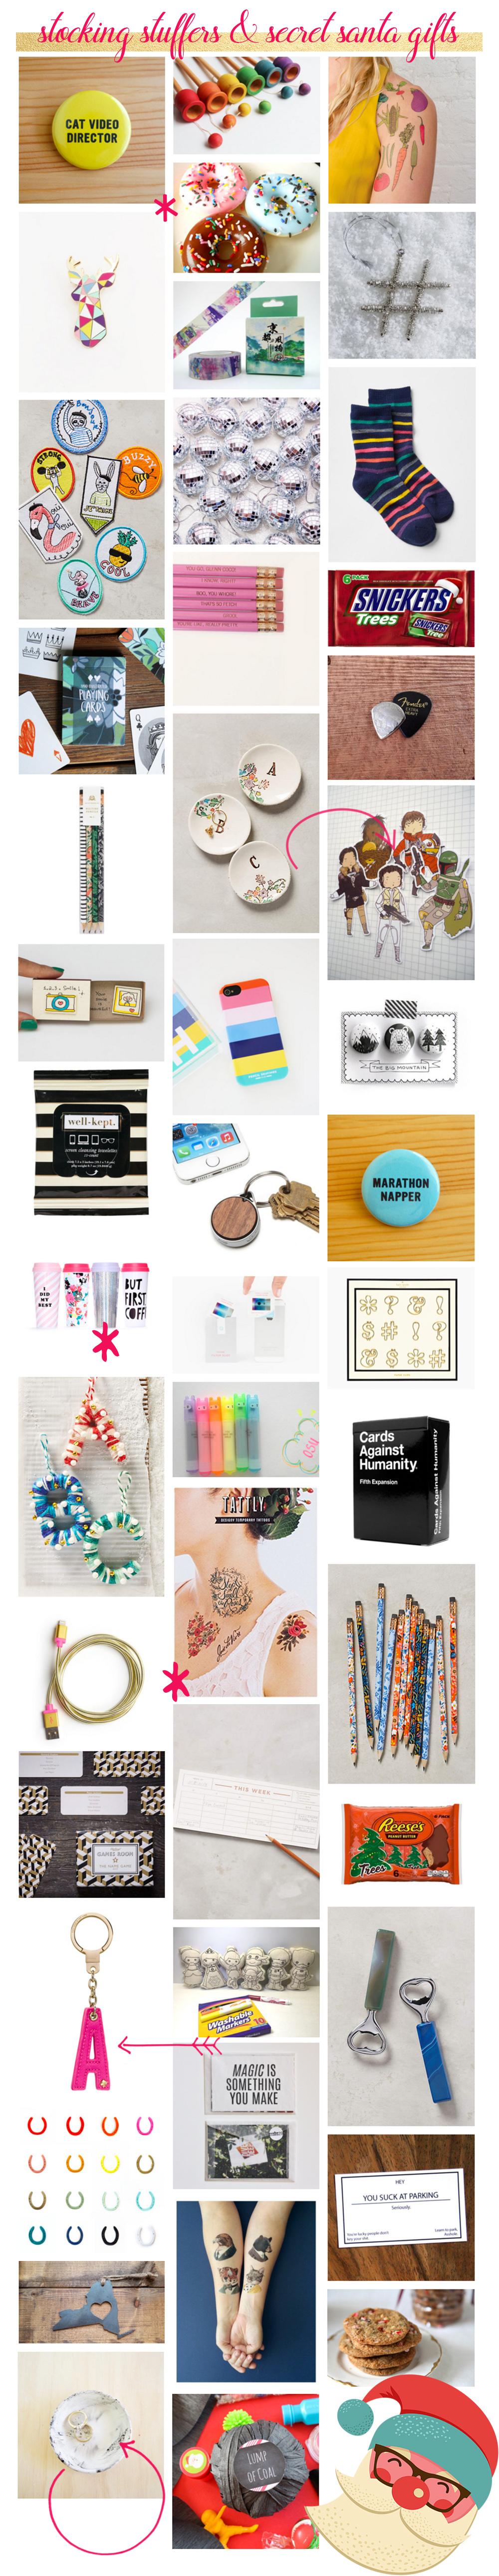 Stocking Stuffers + Secret Santa Gifts